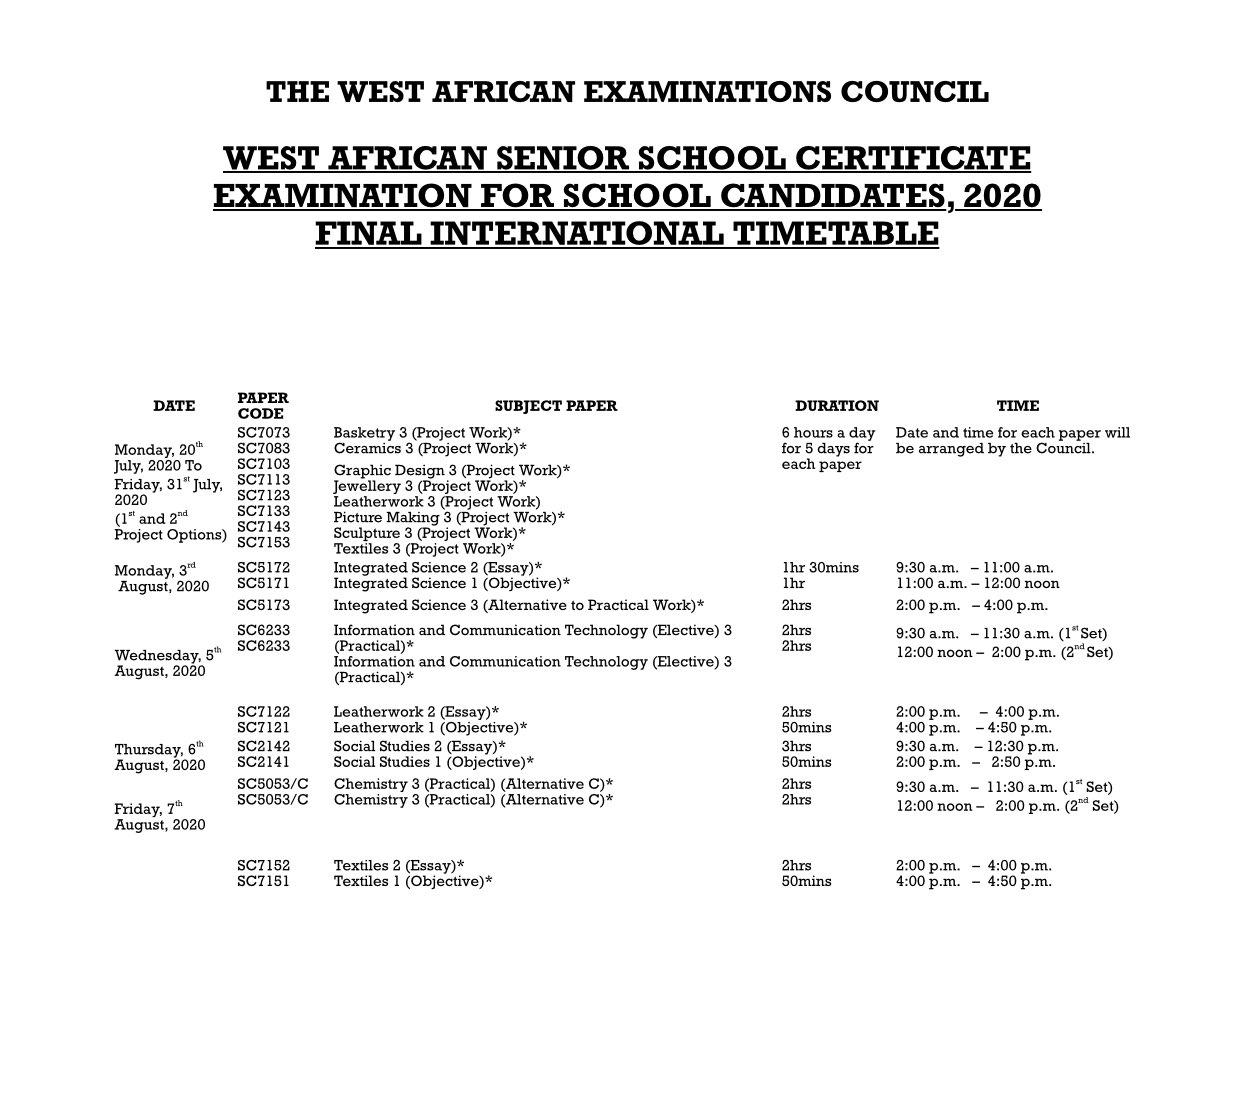 WAEC 2020 Timetable PDF